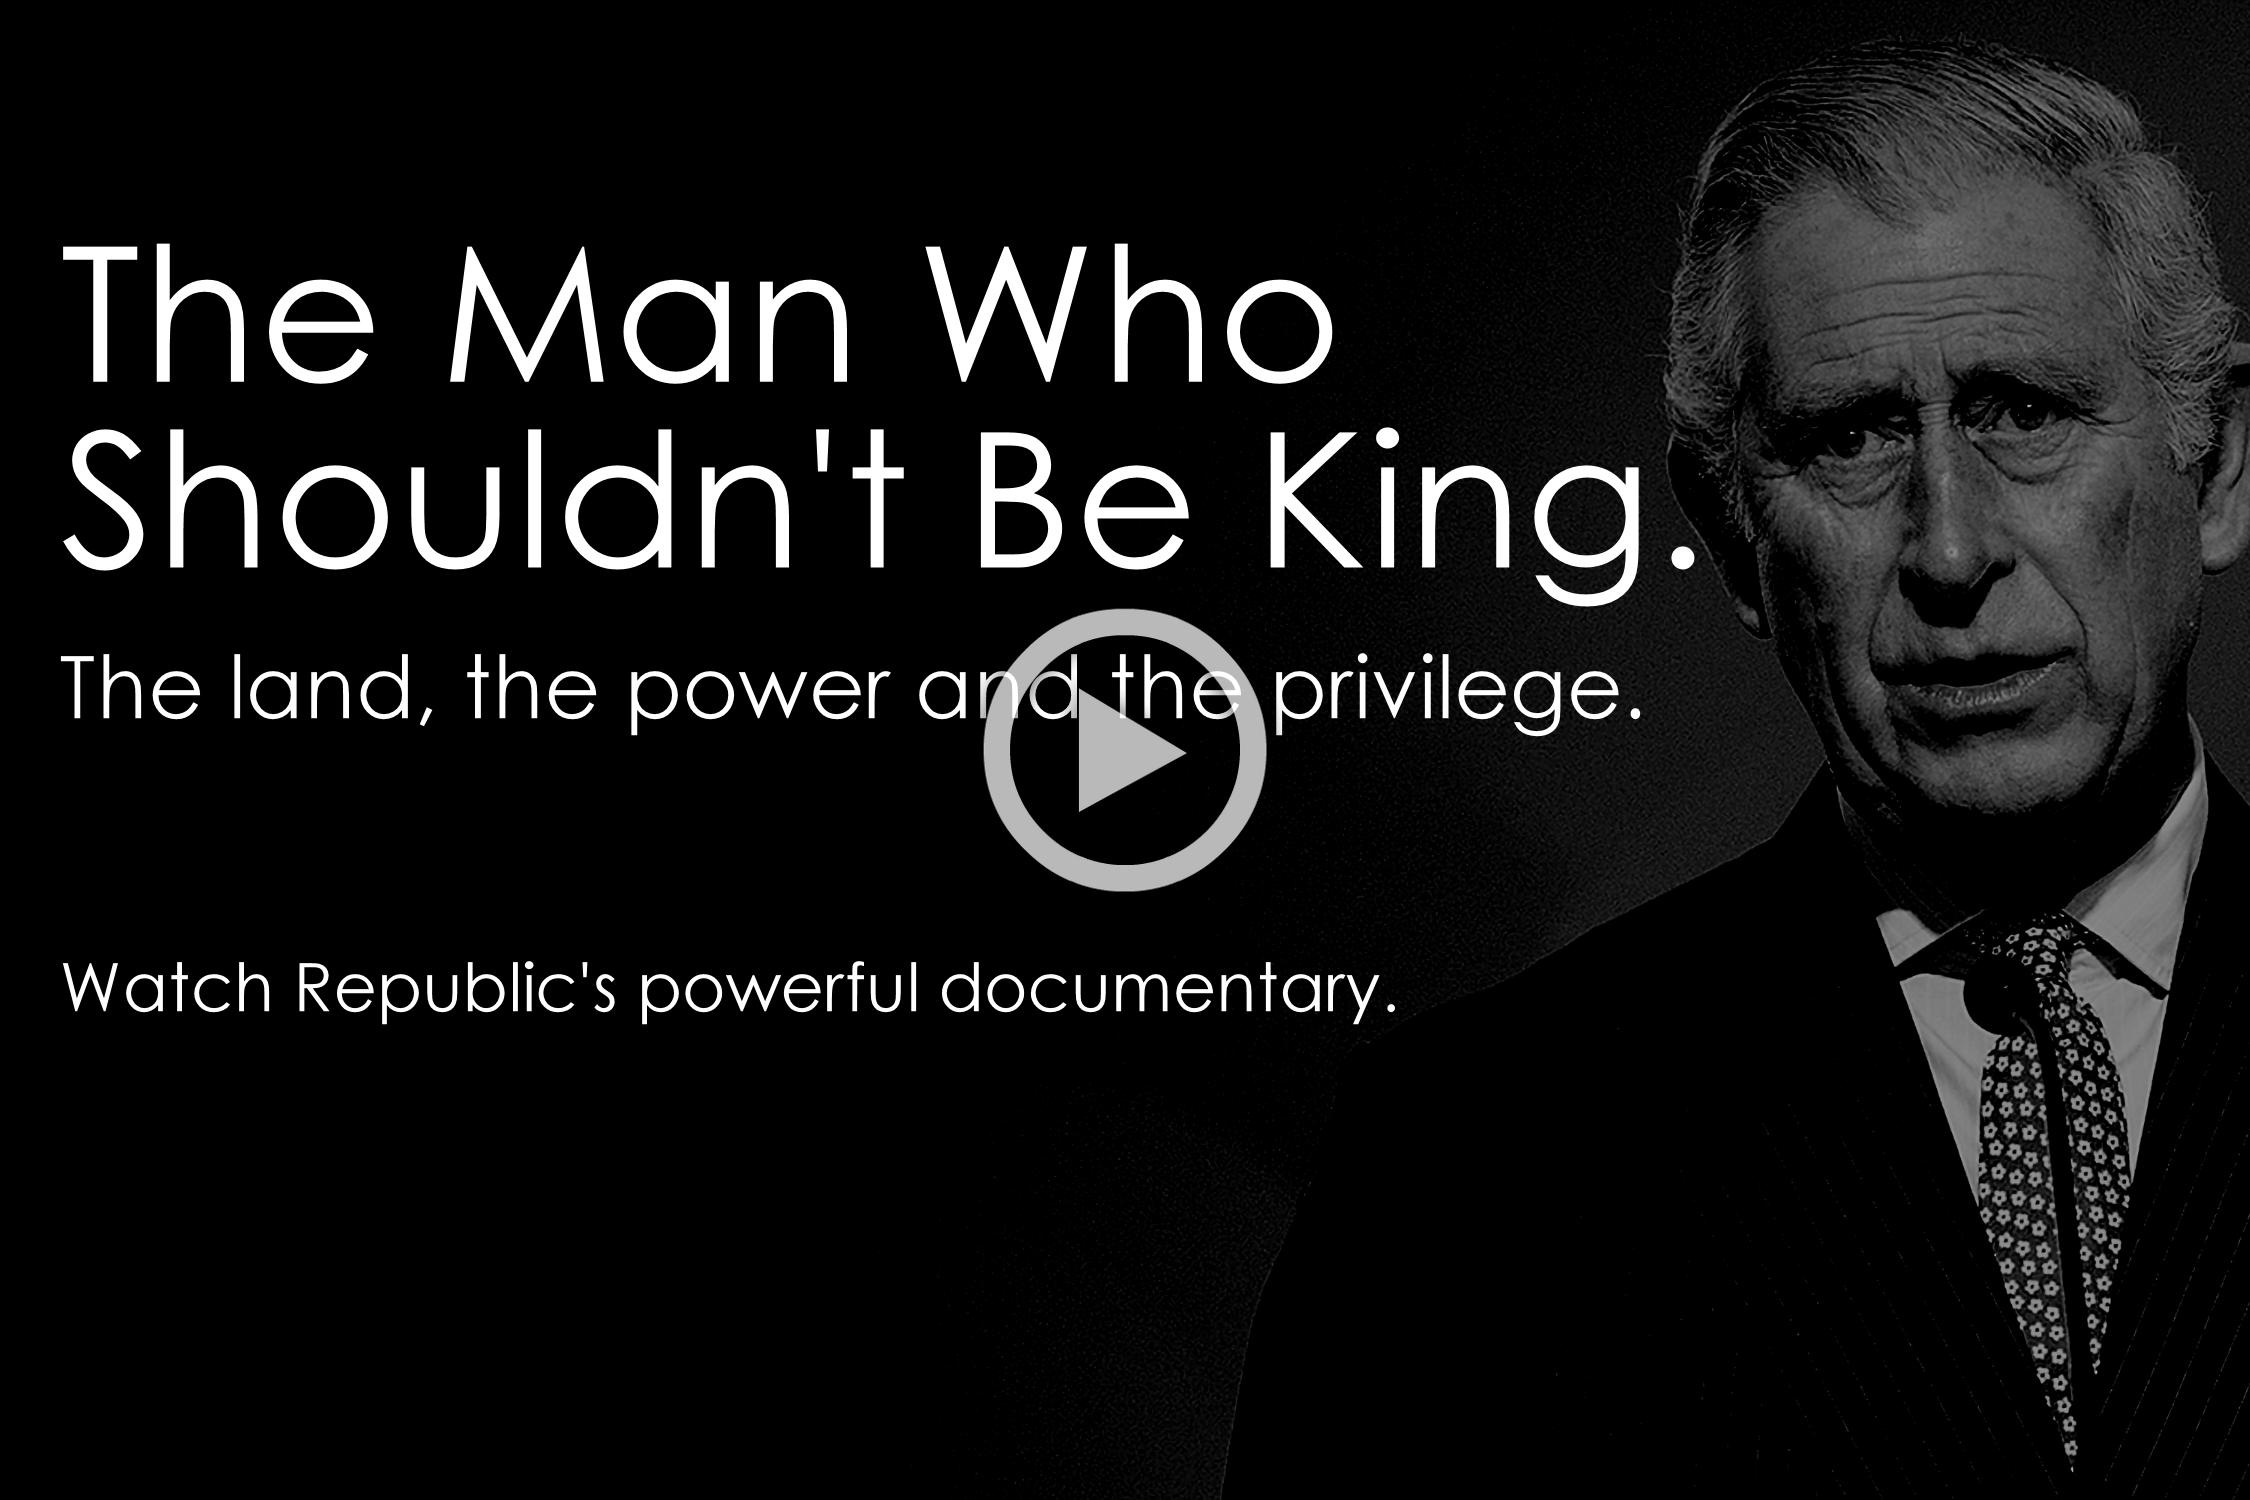 Watch Republic's documentary